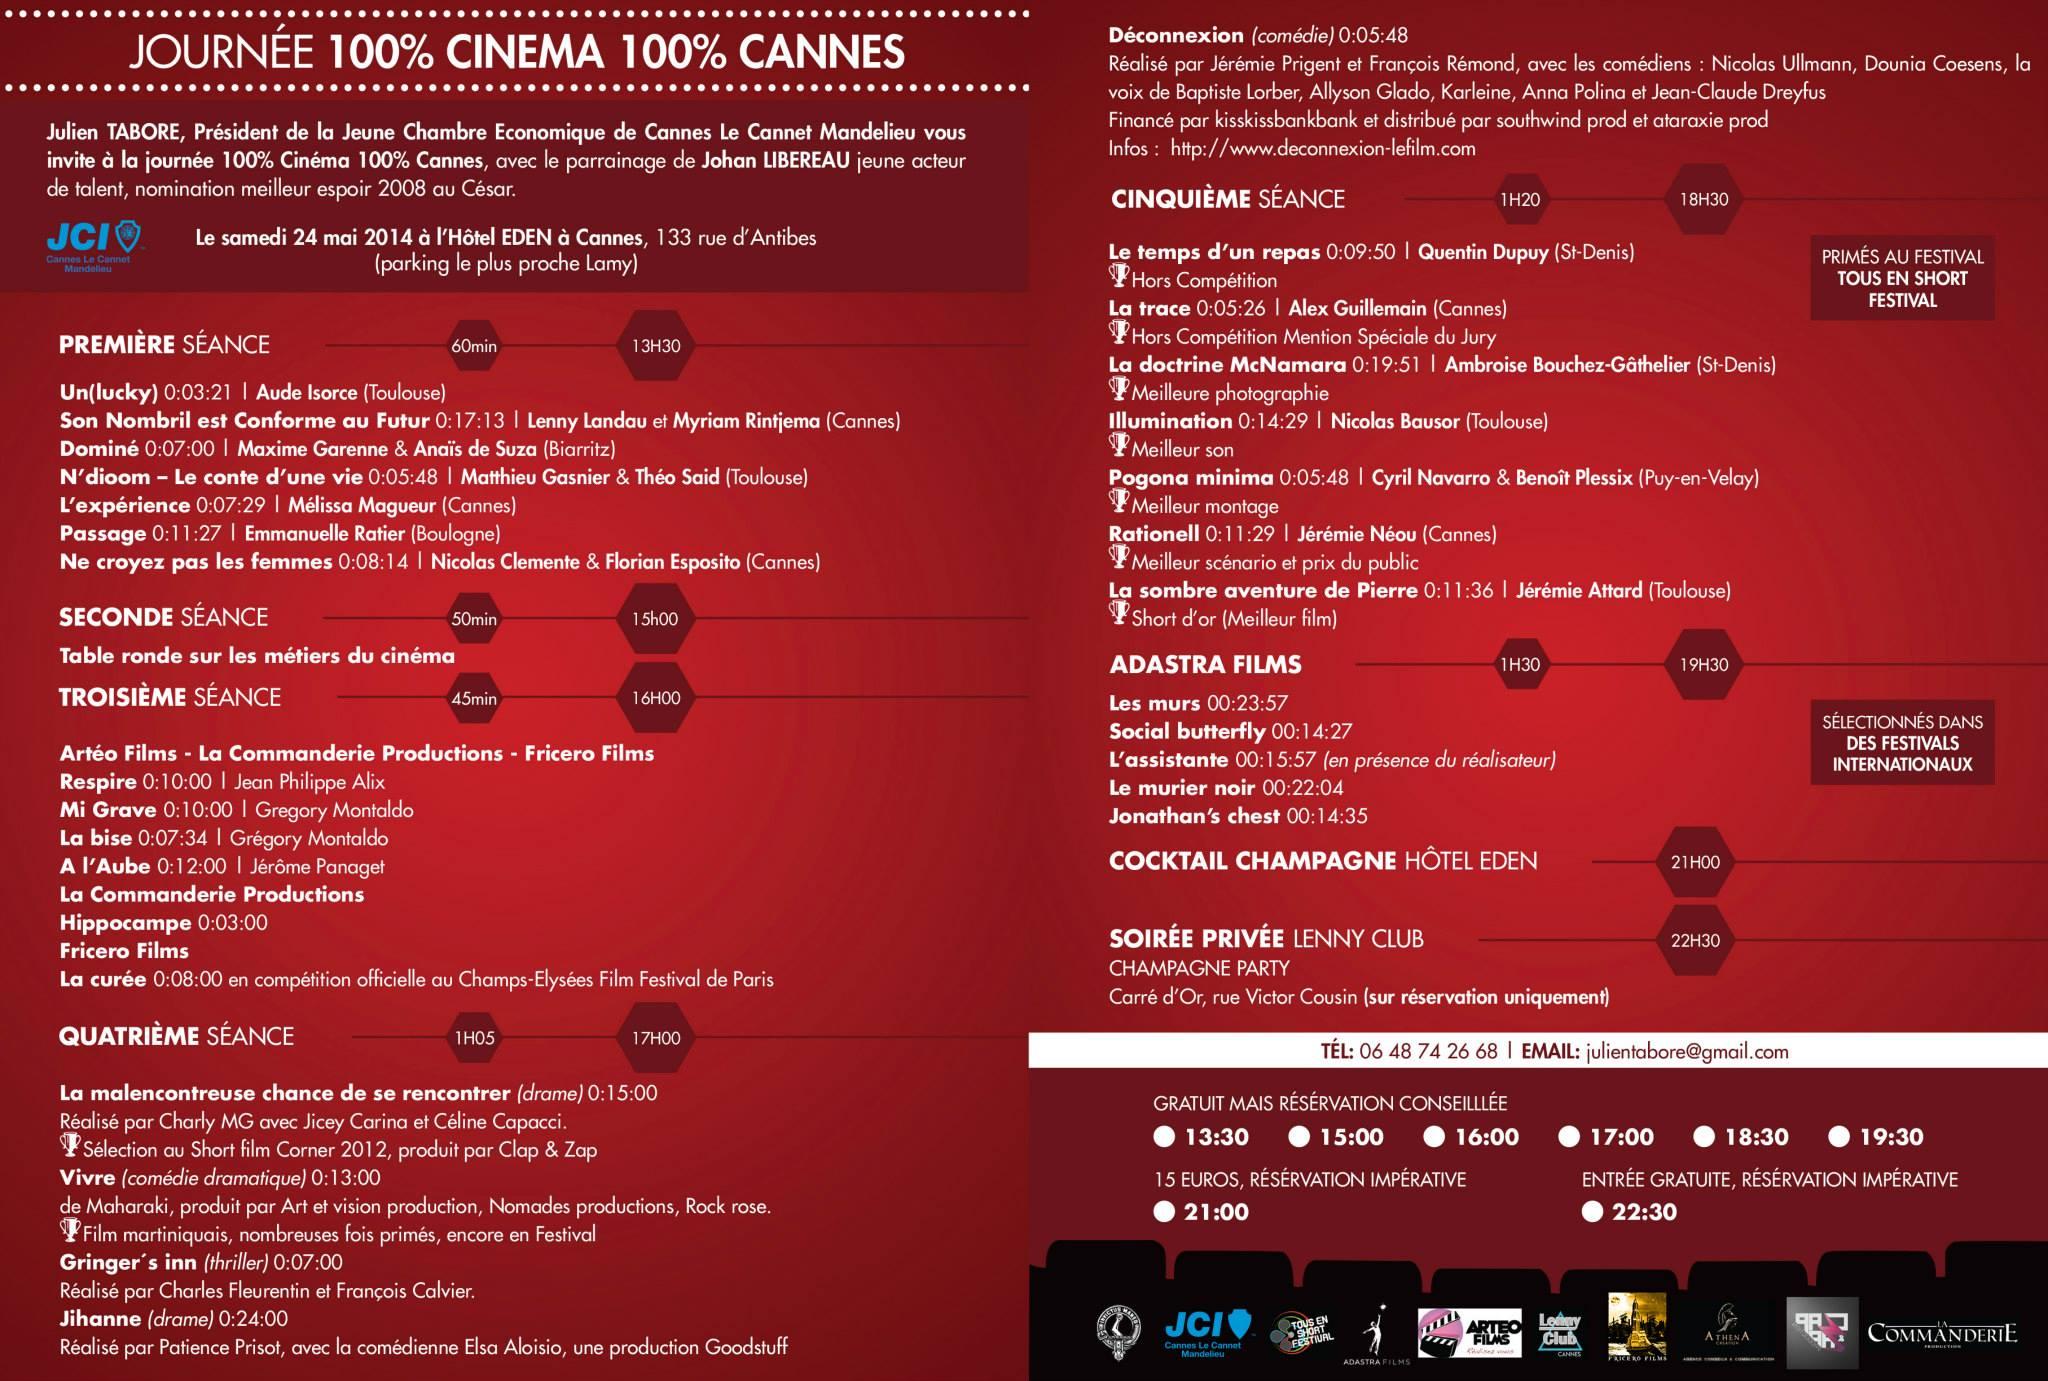 Programme Festival Cannes